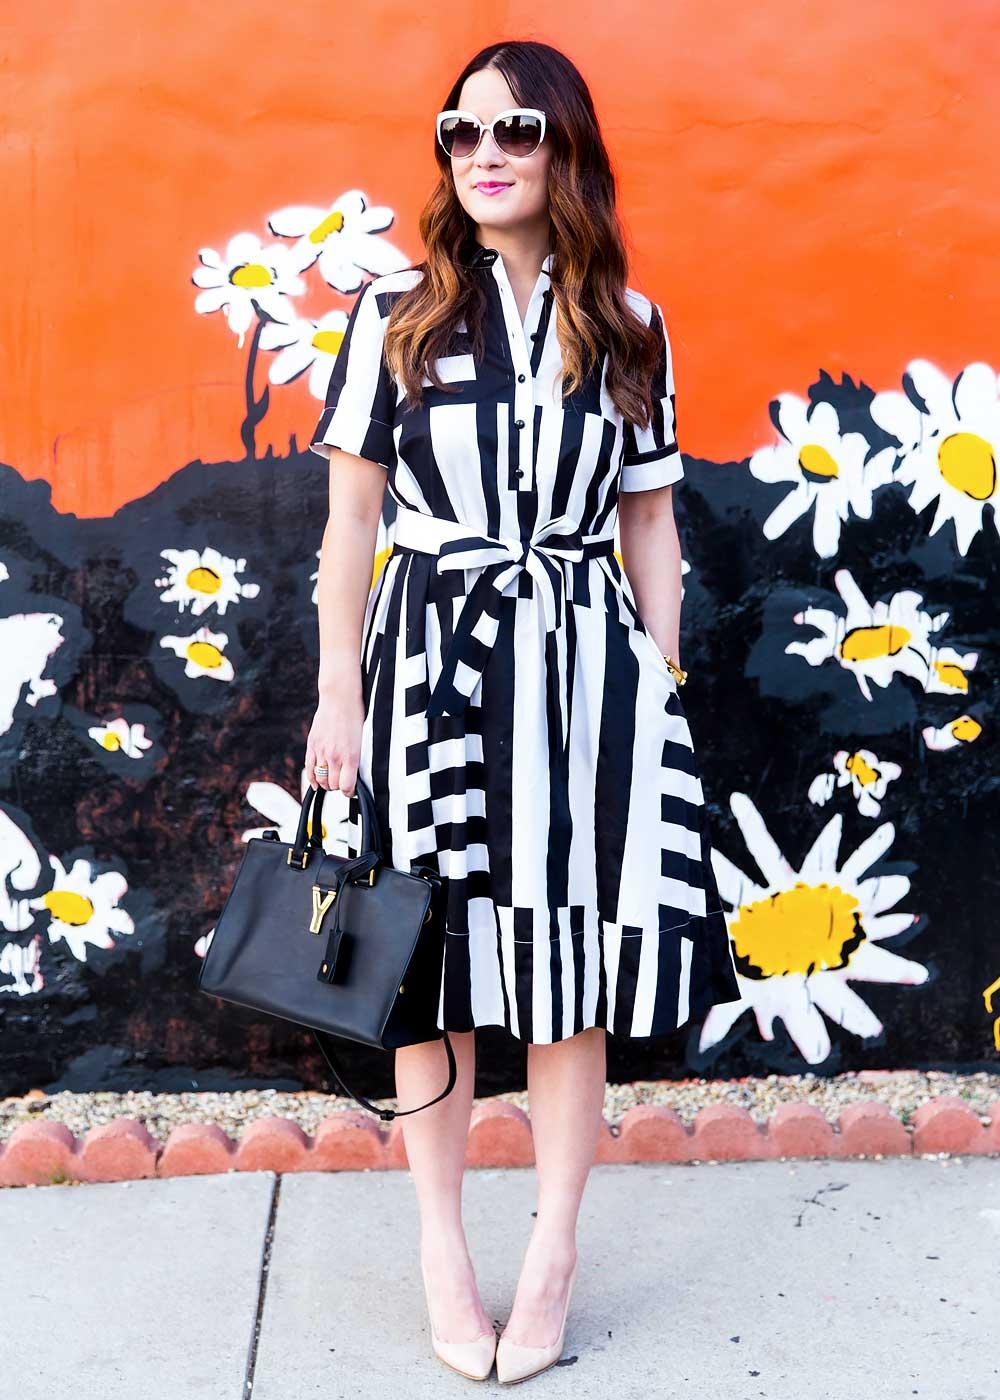 Los Angeles Daisy Mural